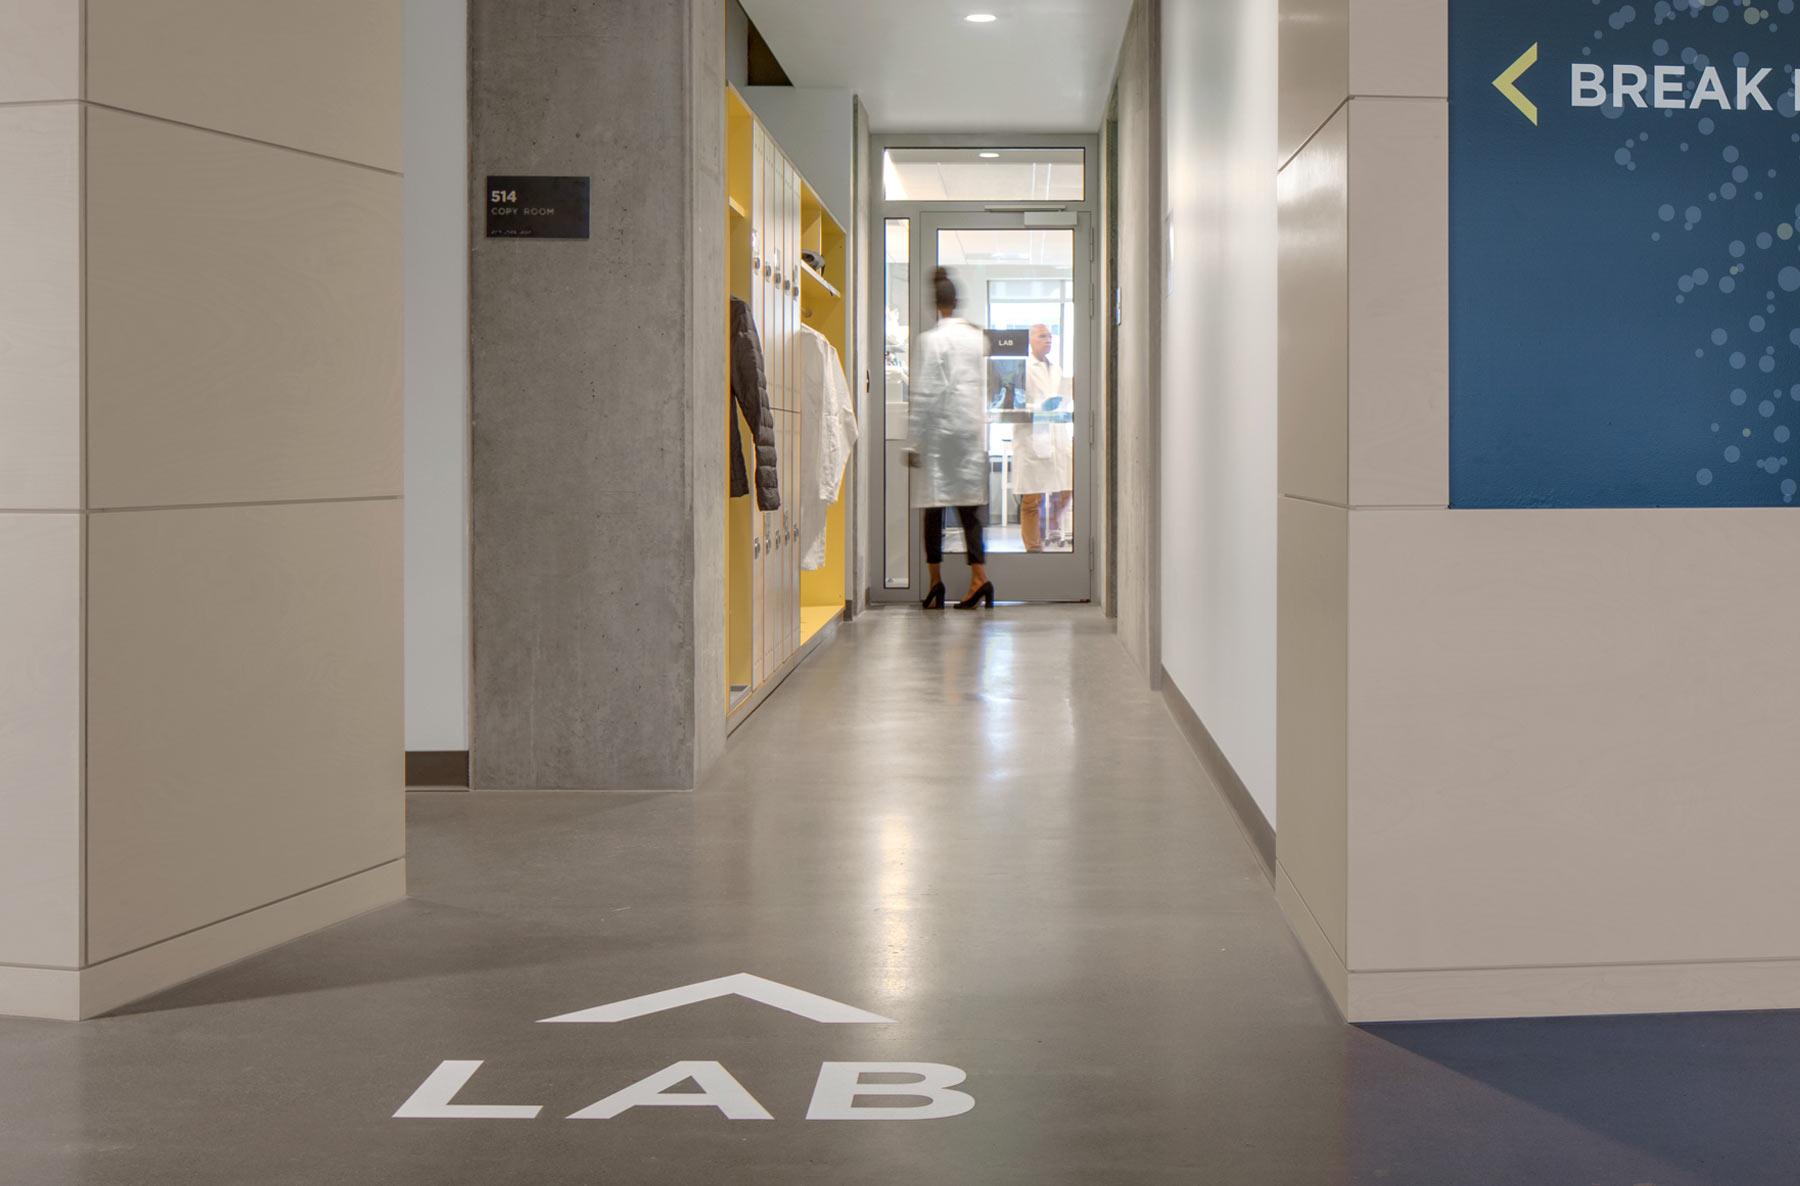 Juno Therapeutics, a Bristol Meyers Squibb Company - Scientific Workplace and Research Center